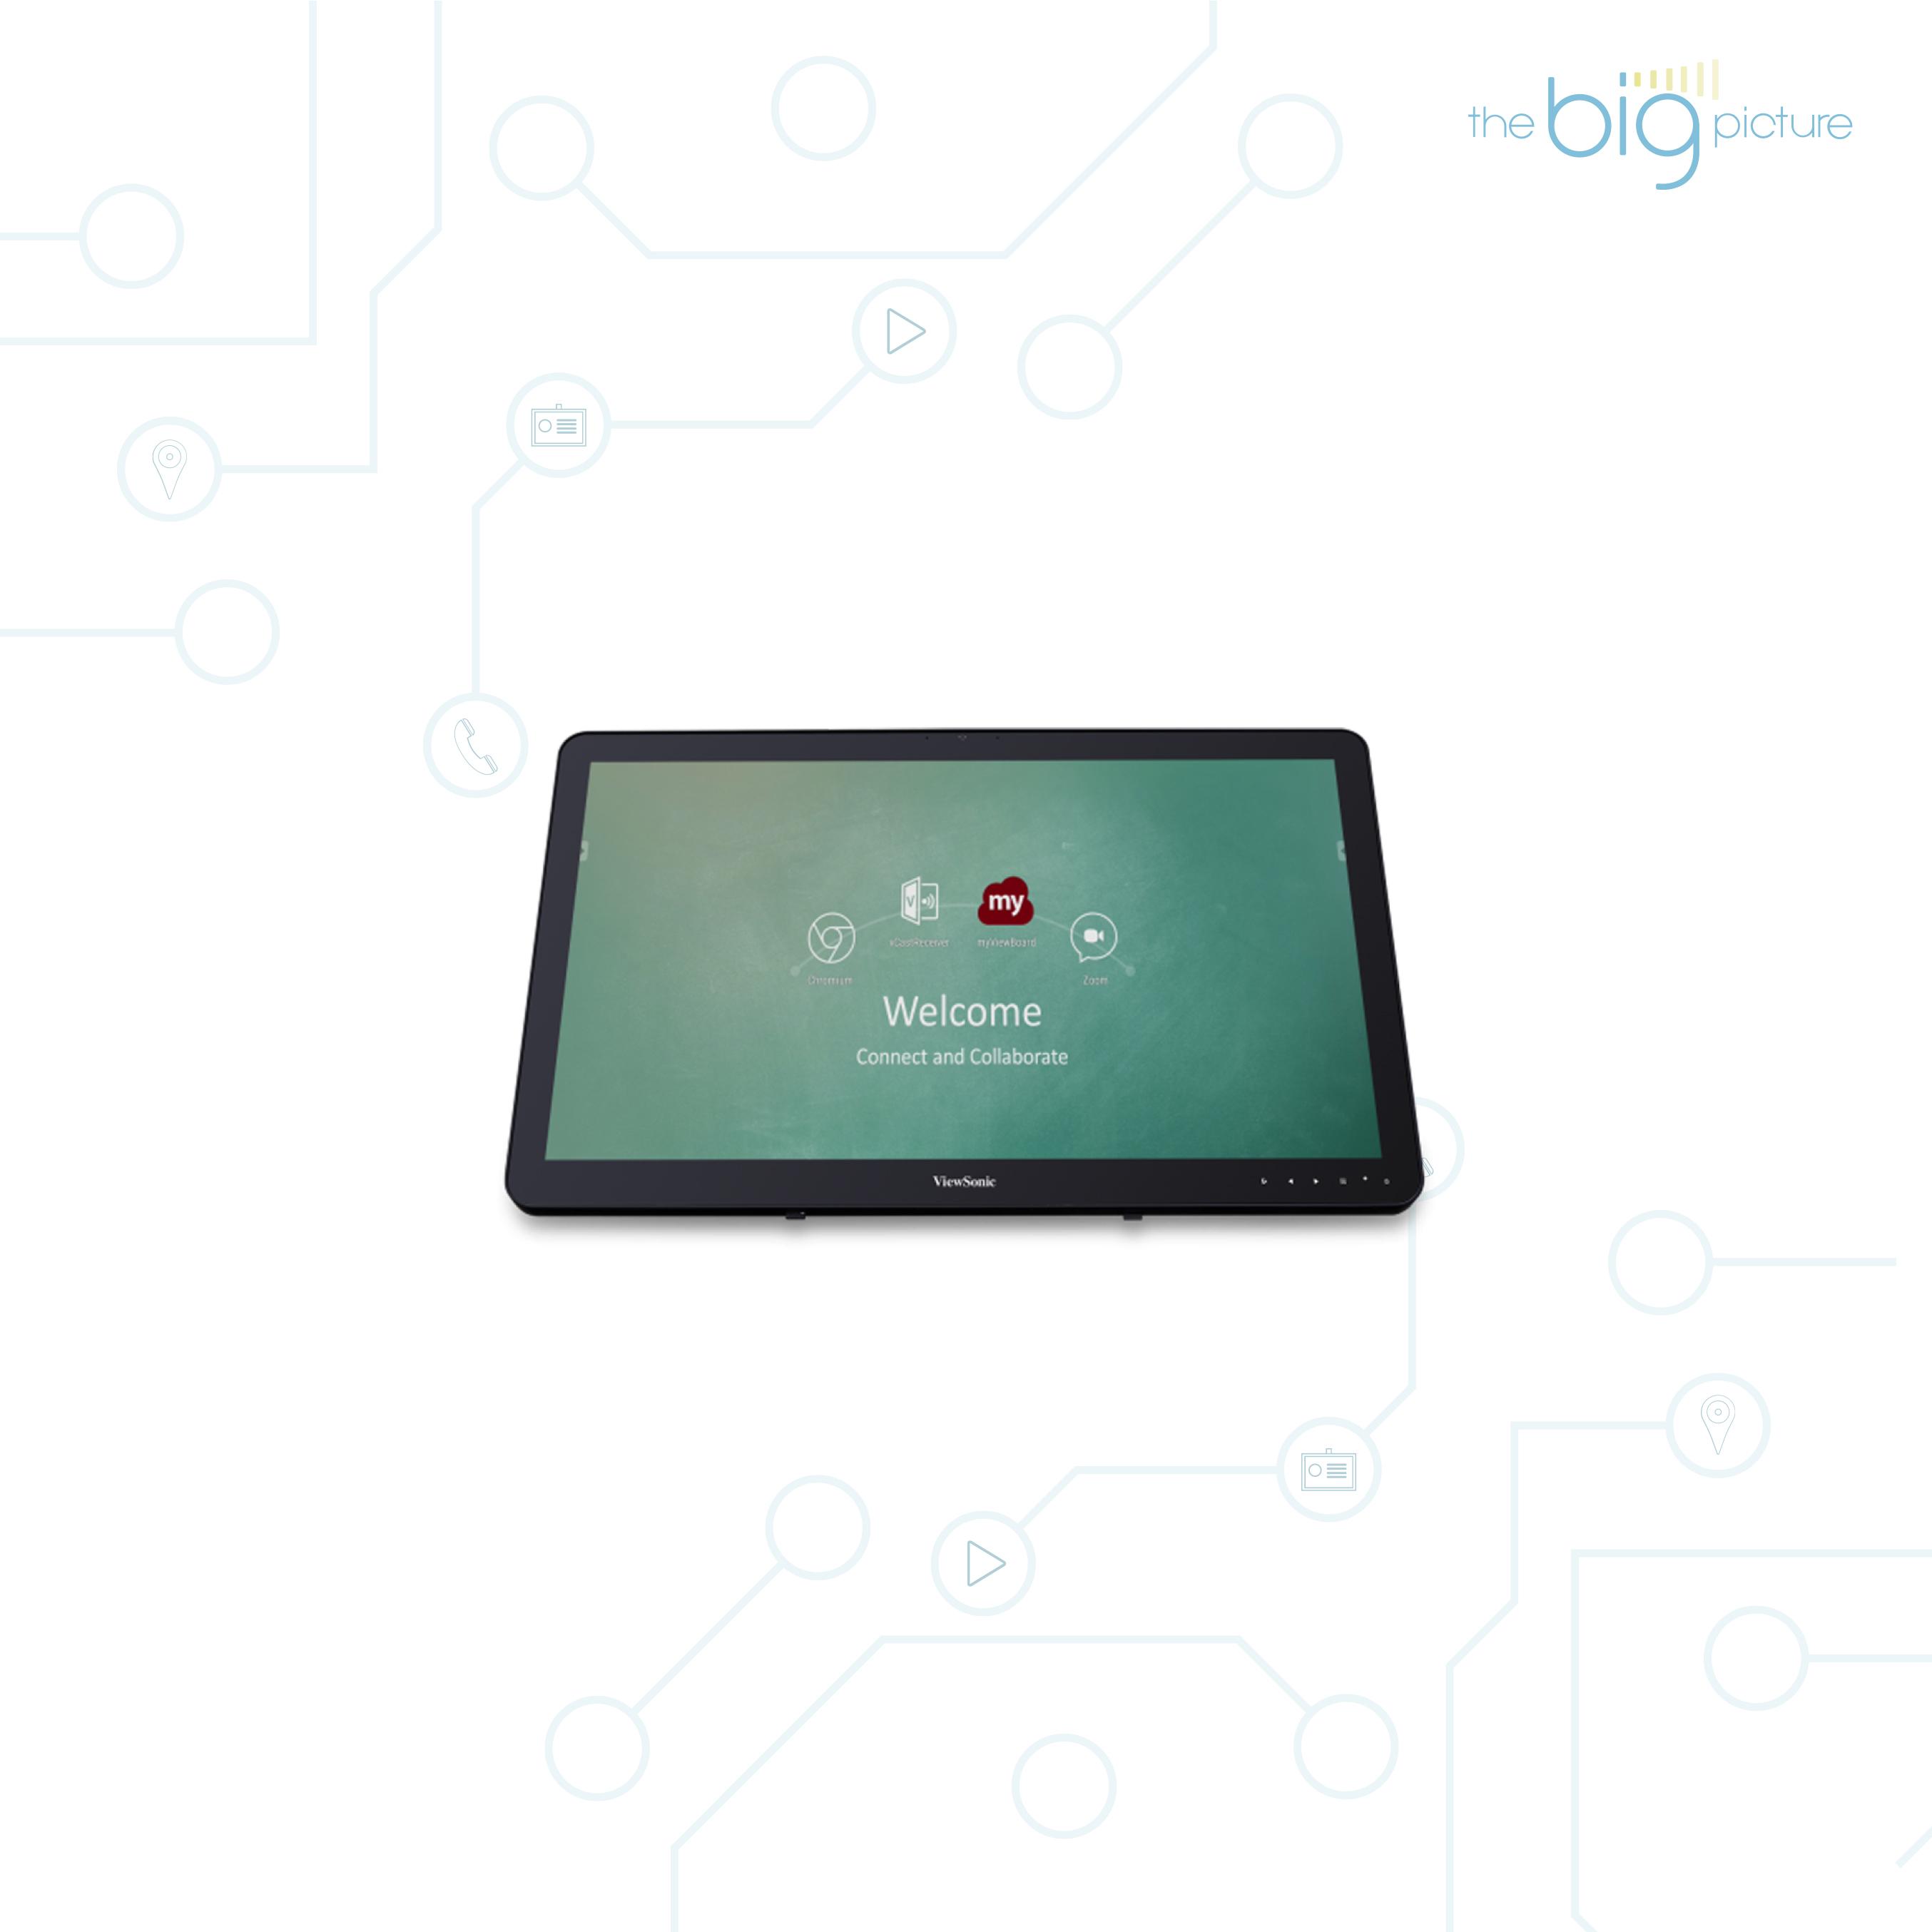 Viewsonic IFP2410 smart display